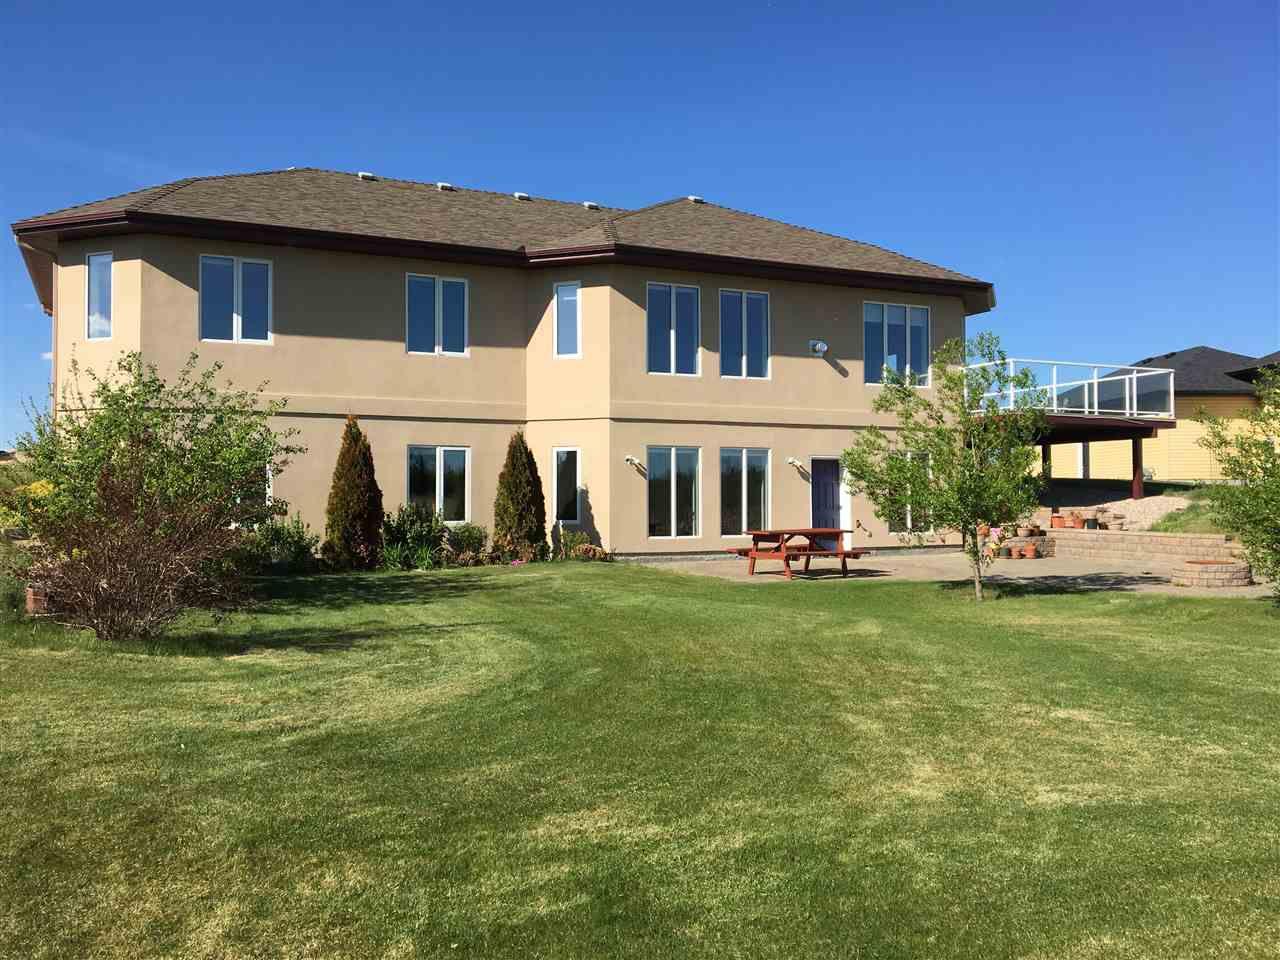 Main Photo: 53017 Range Road 223: Rural Strathcona County House for sale : MLS®# E4157101